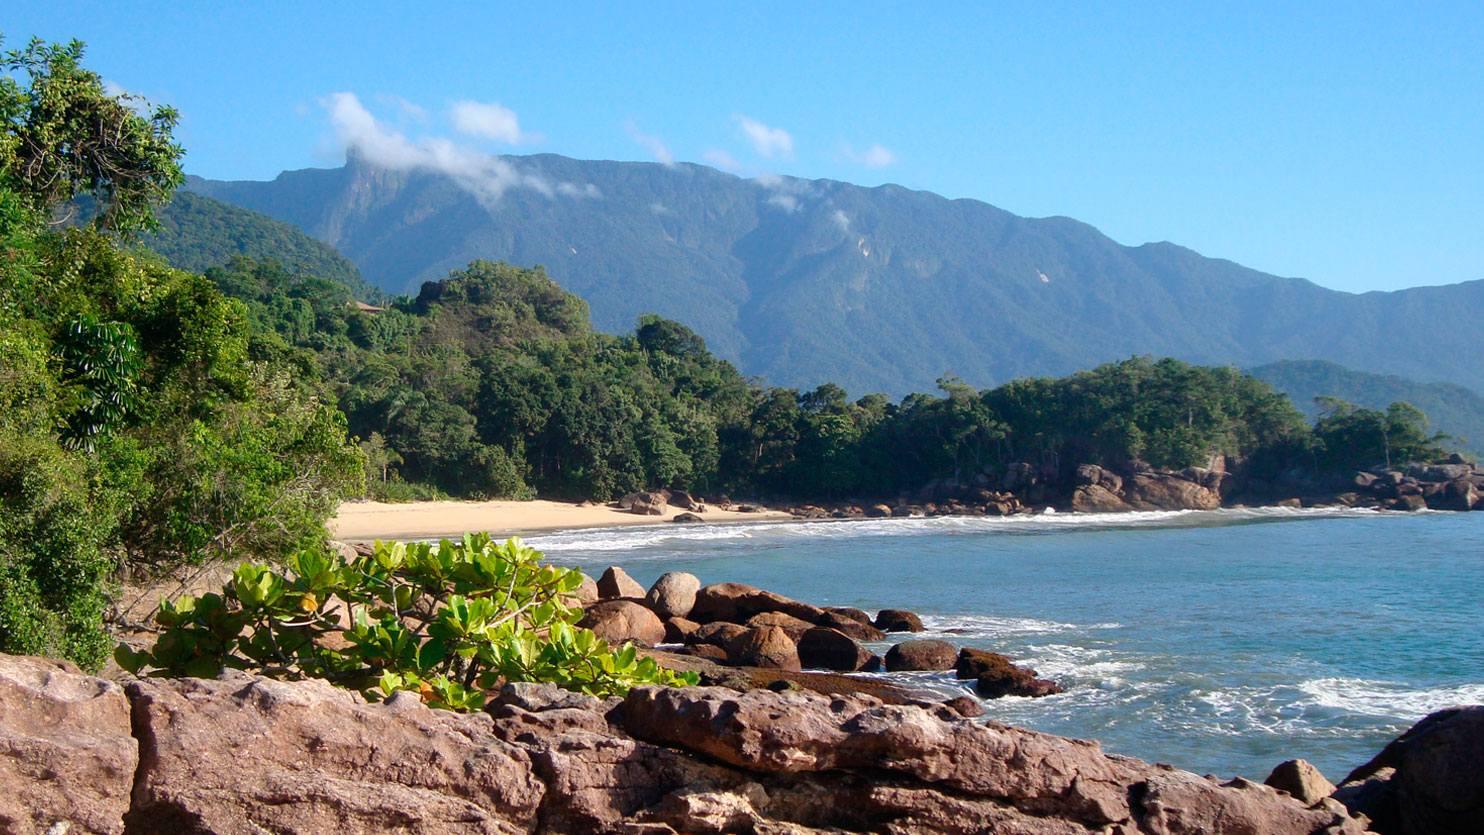 Pedras em praia de Ubatuba